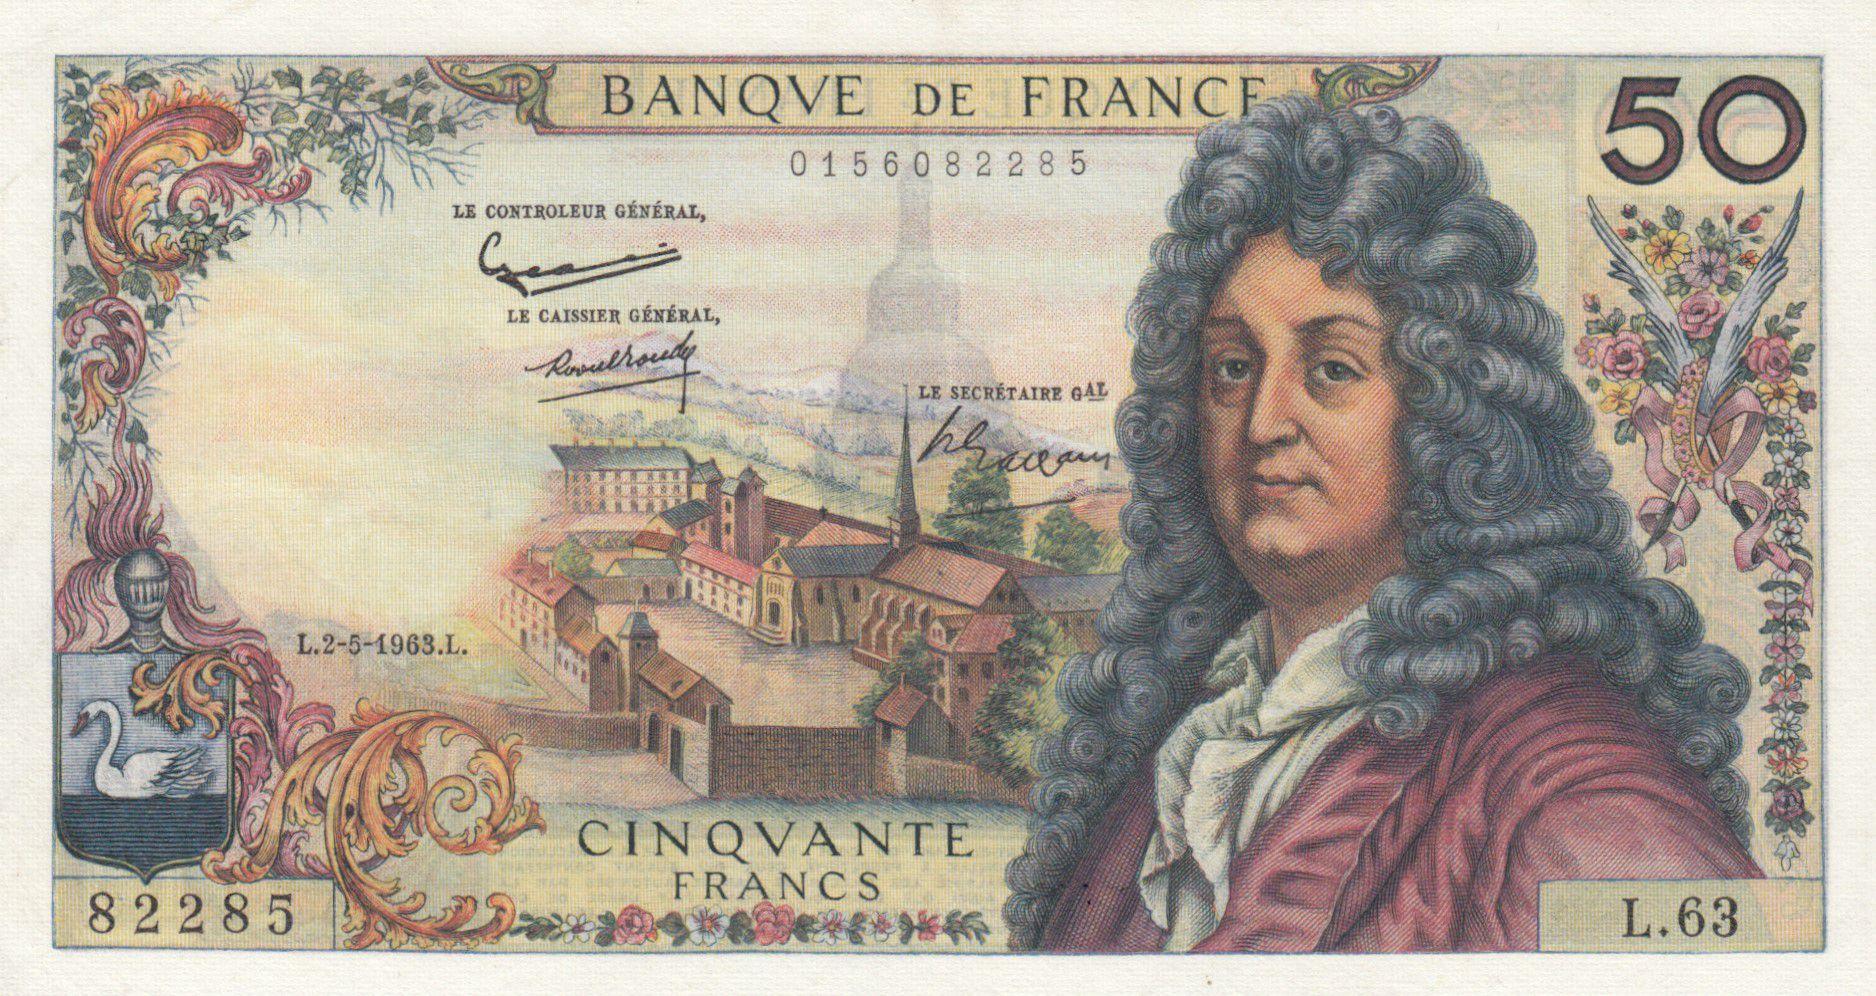 France 50 Francs Racine 02-05-1963 - Serial L.63 - XF+